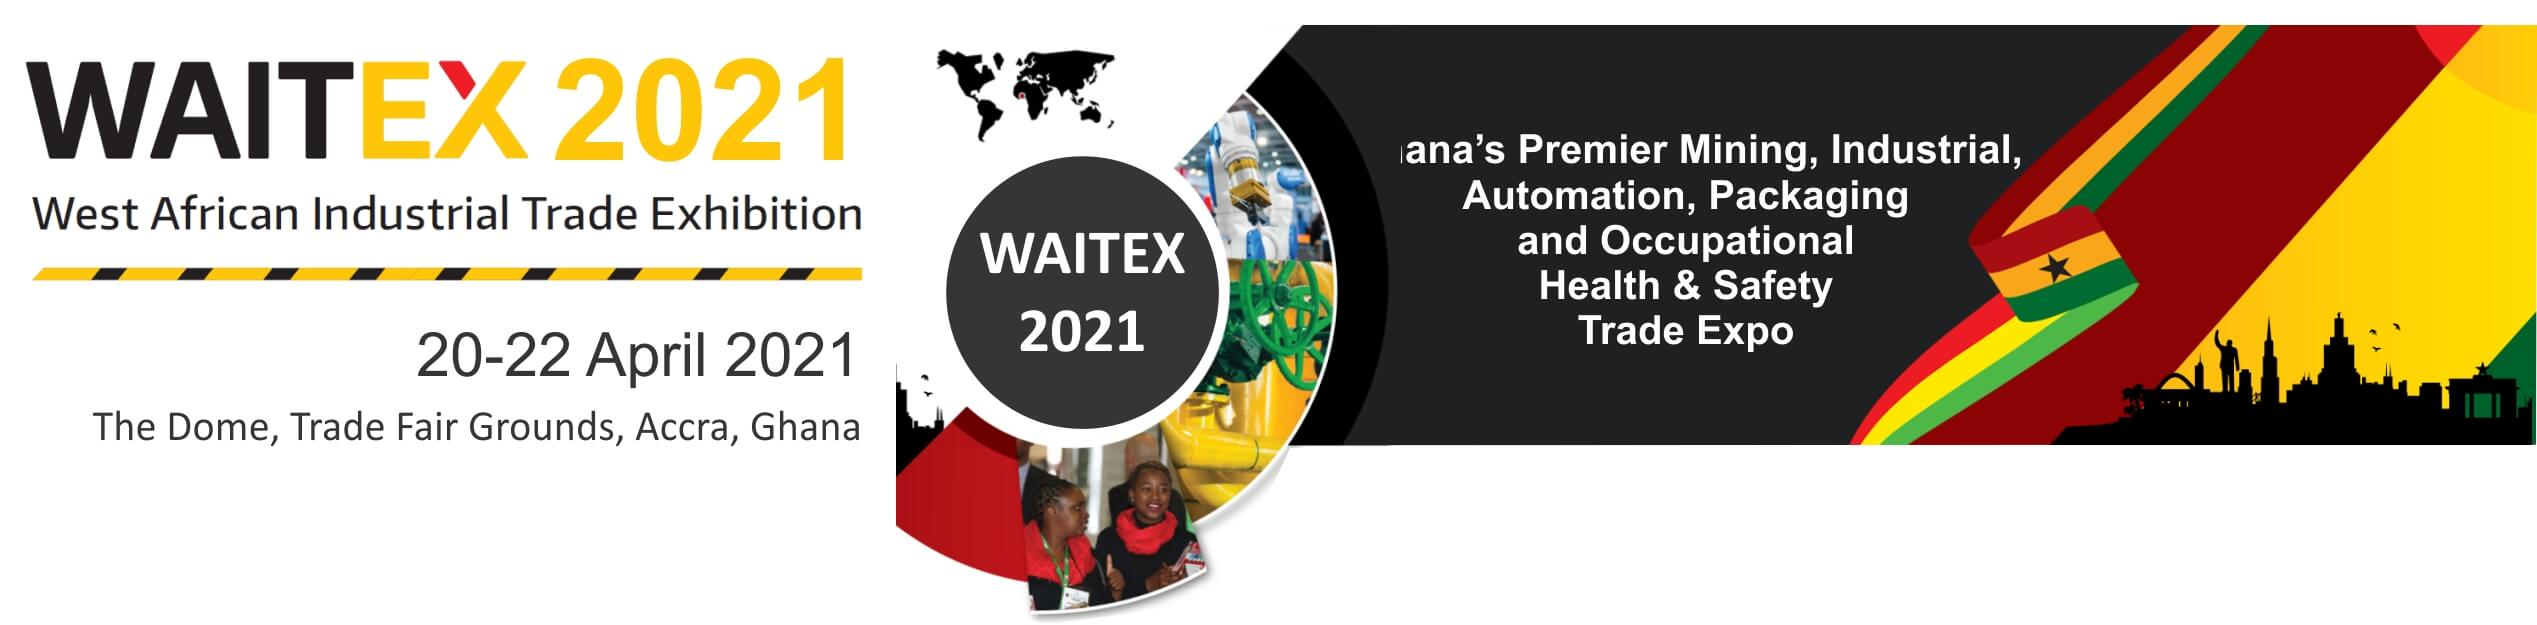 WAITEX 2021